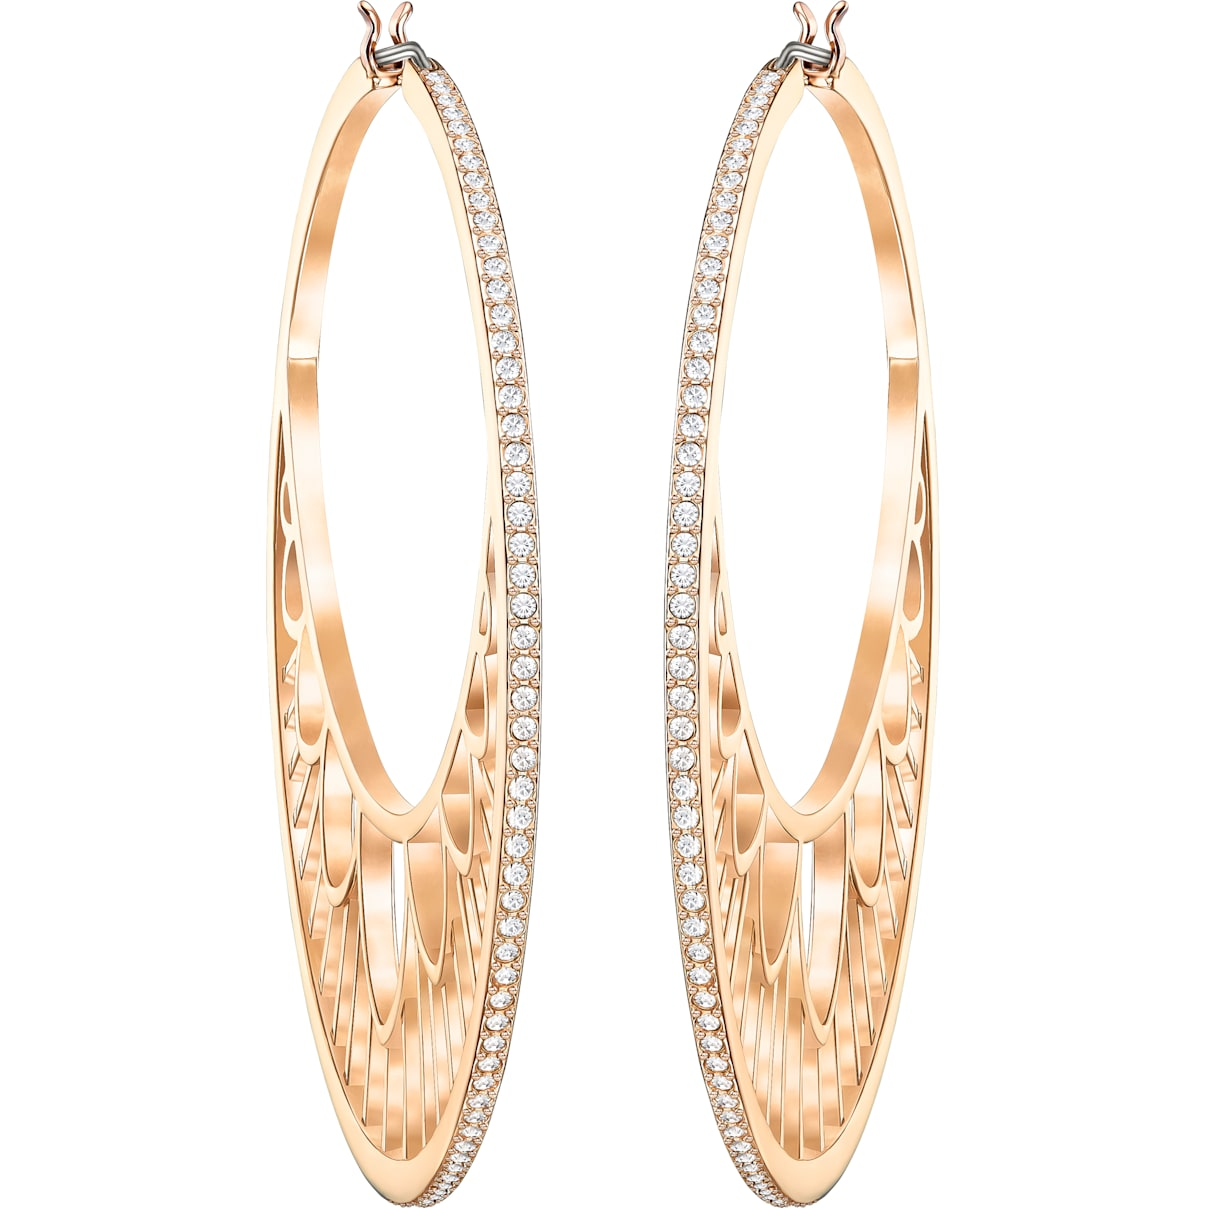 Swarovski Georgette Hoop Pierced Earrings, White, Rose-gold tone plated